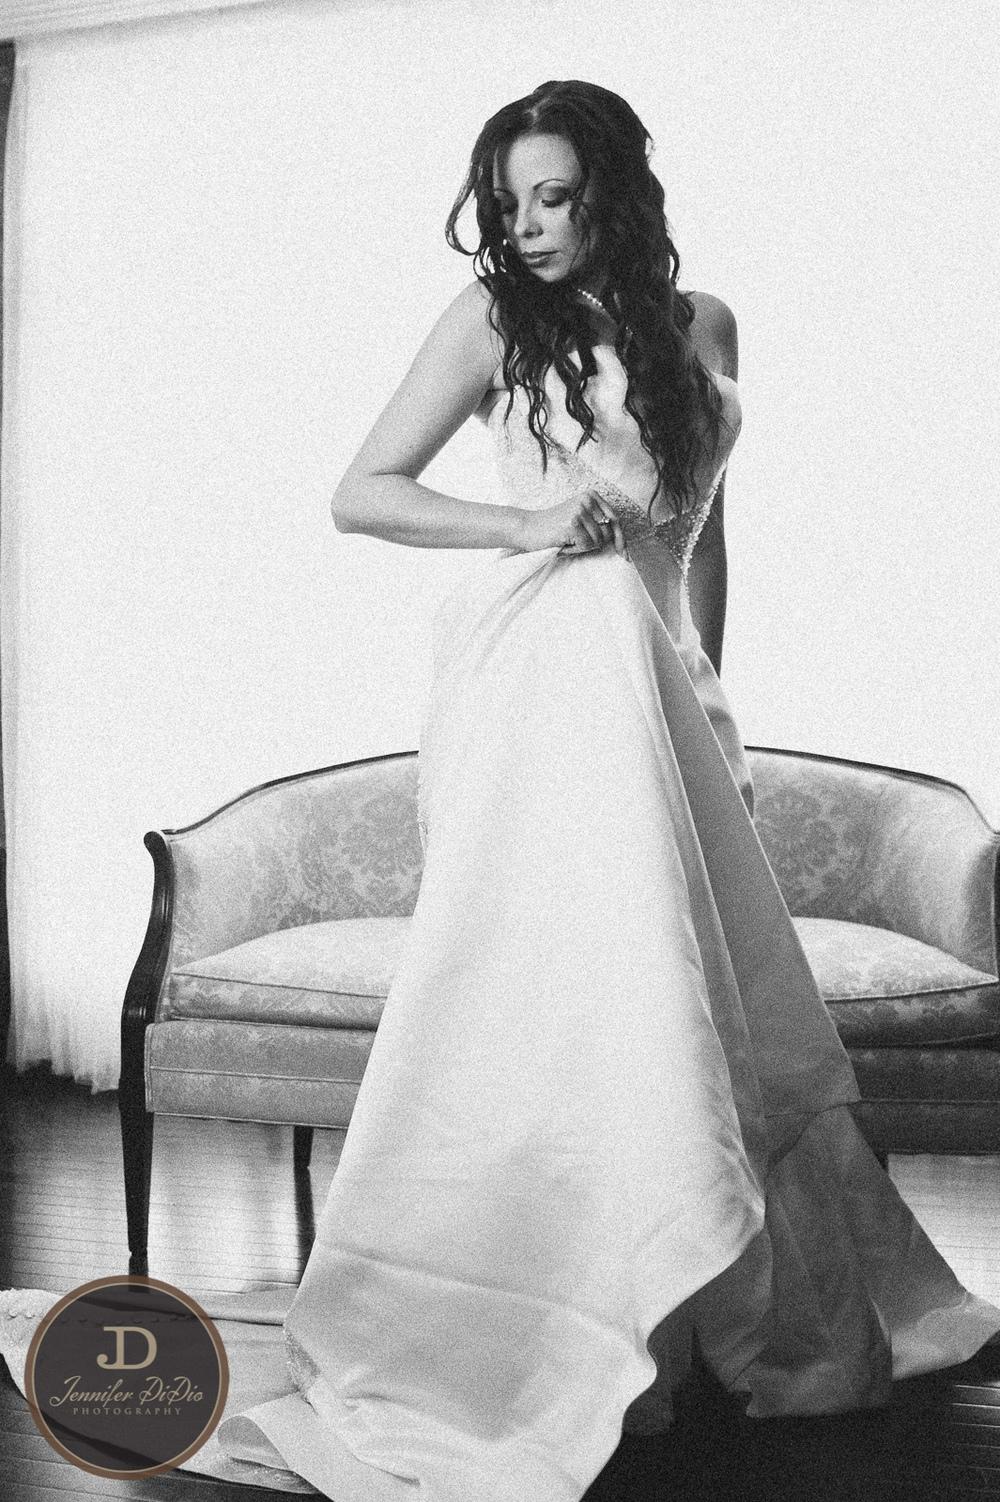 Jennifer.DiDio.Photography.Miller.Jamie.2015-257.jpg